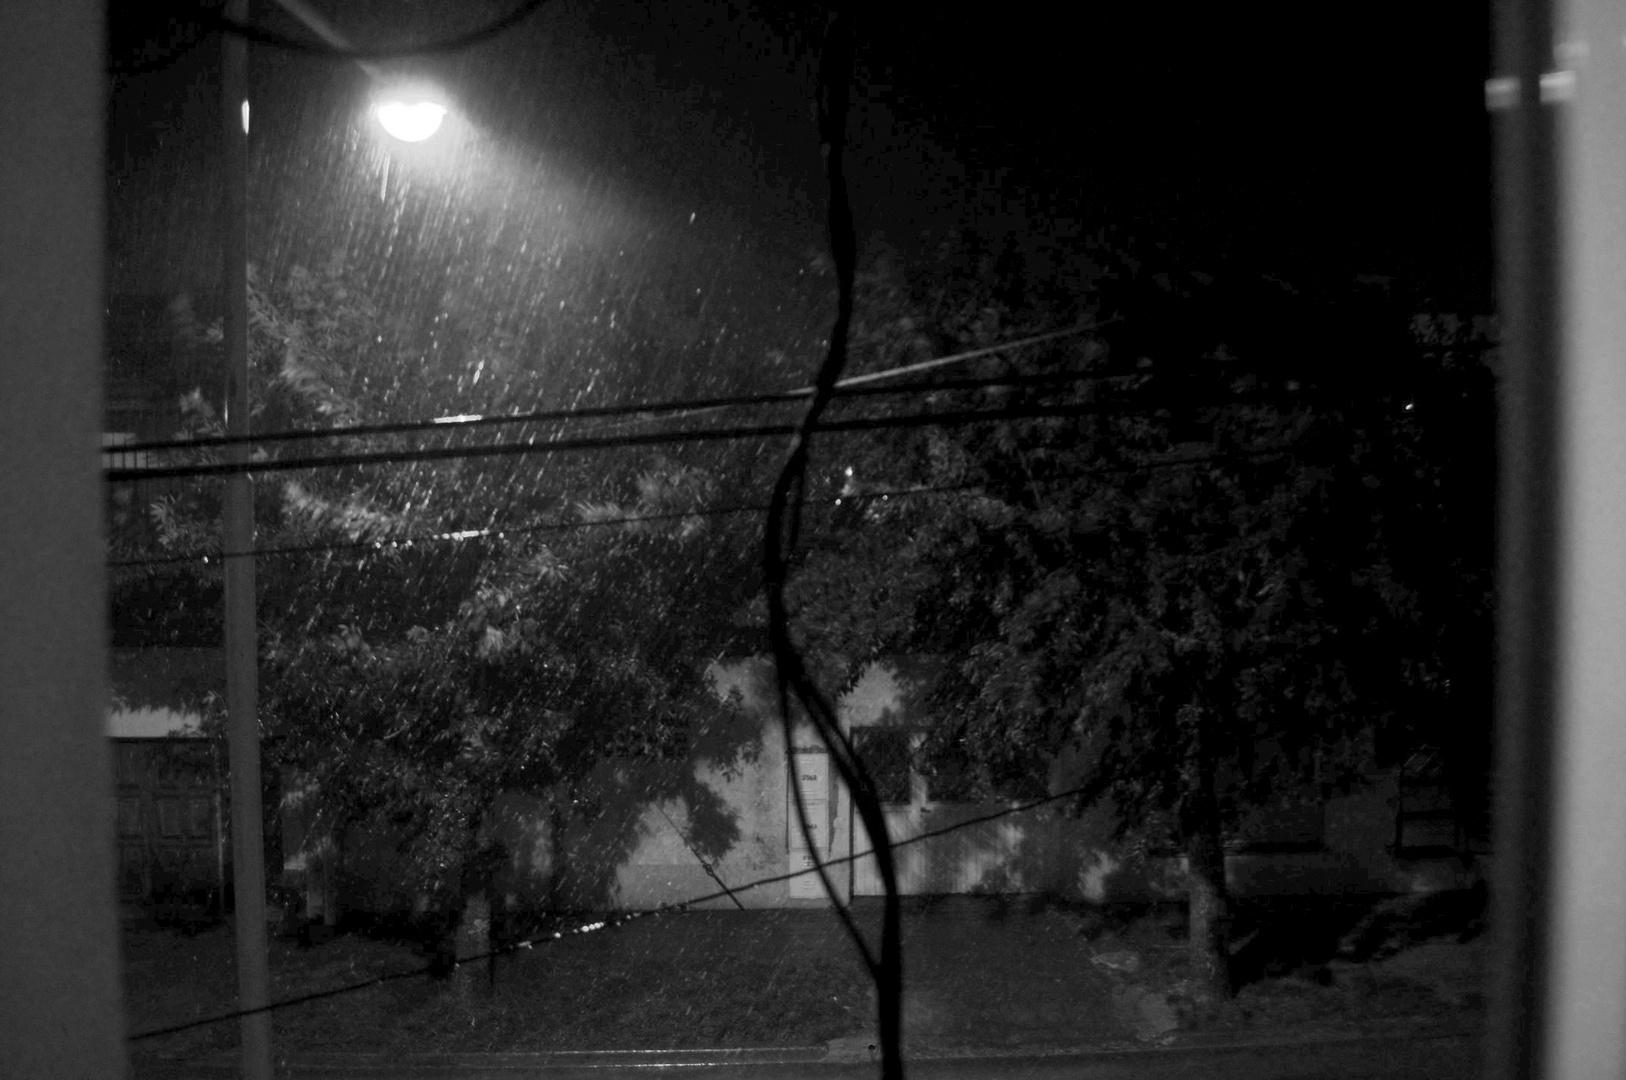 lluvia contra farol